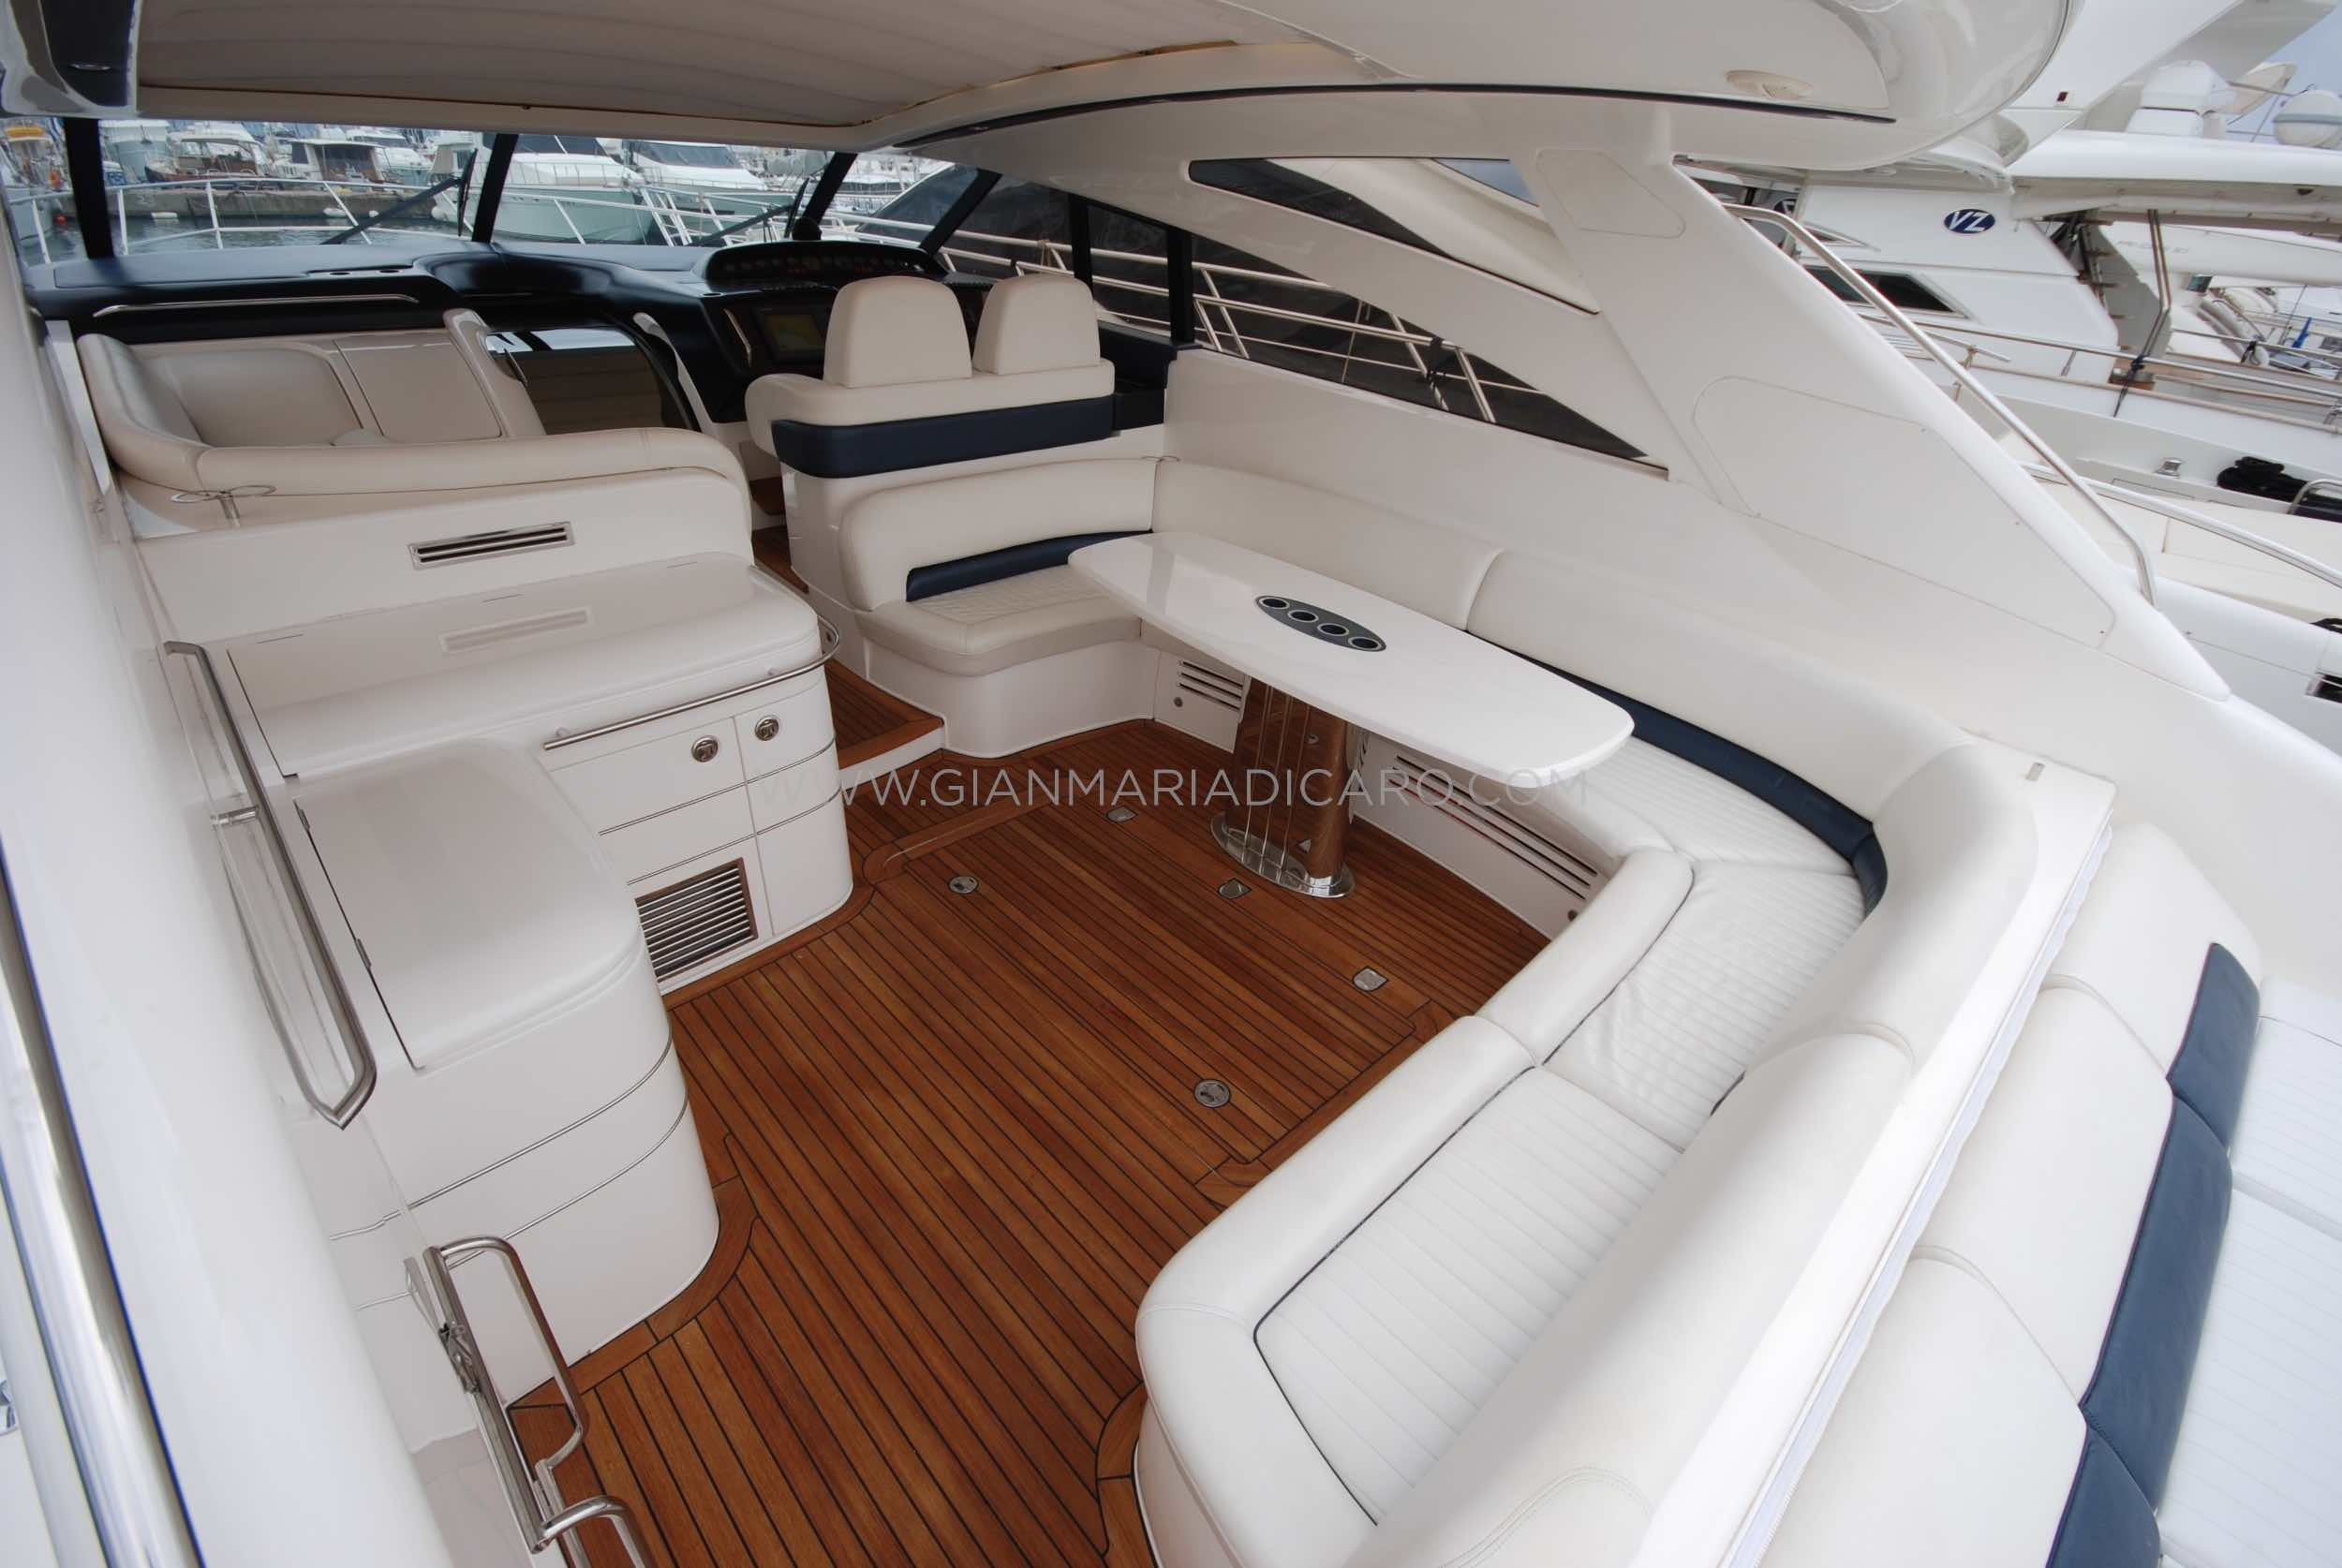 princess-yachts-v58-maestro-di-vita-for-sale-6.jpg